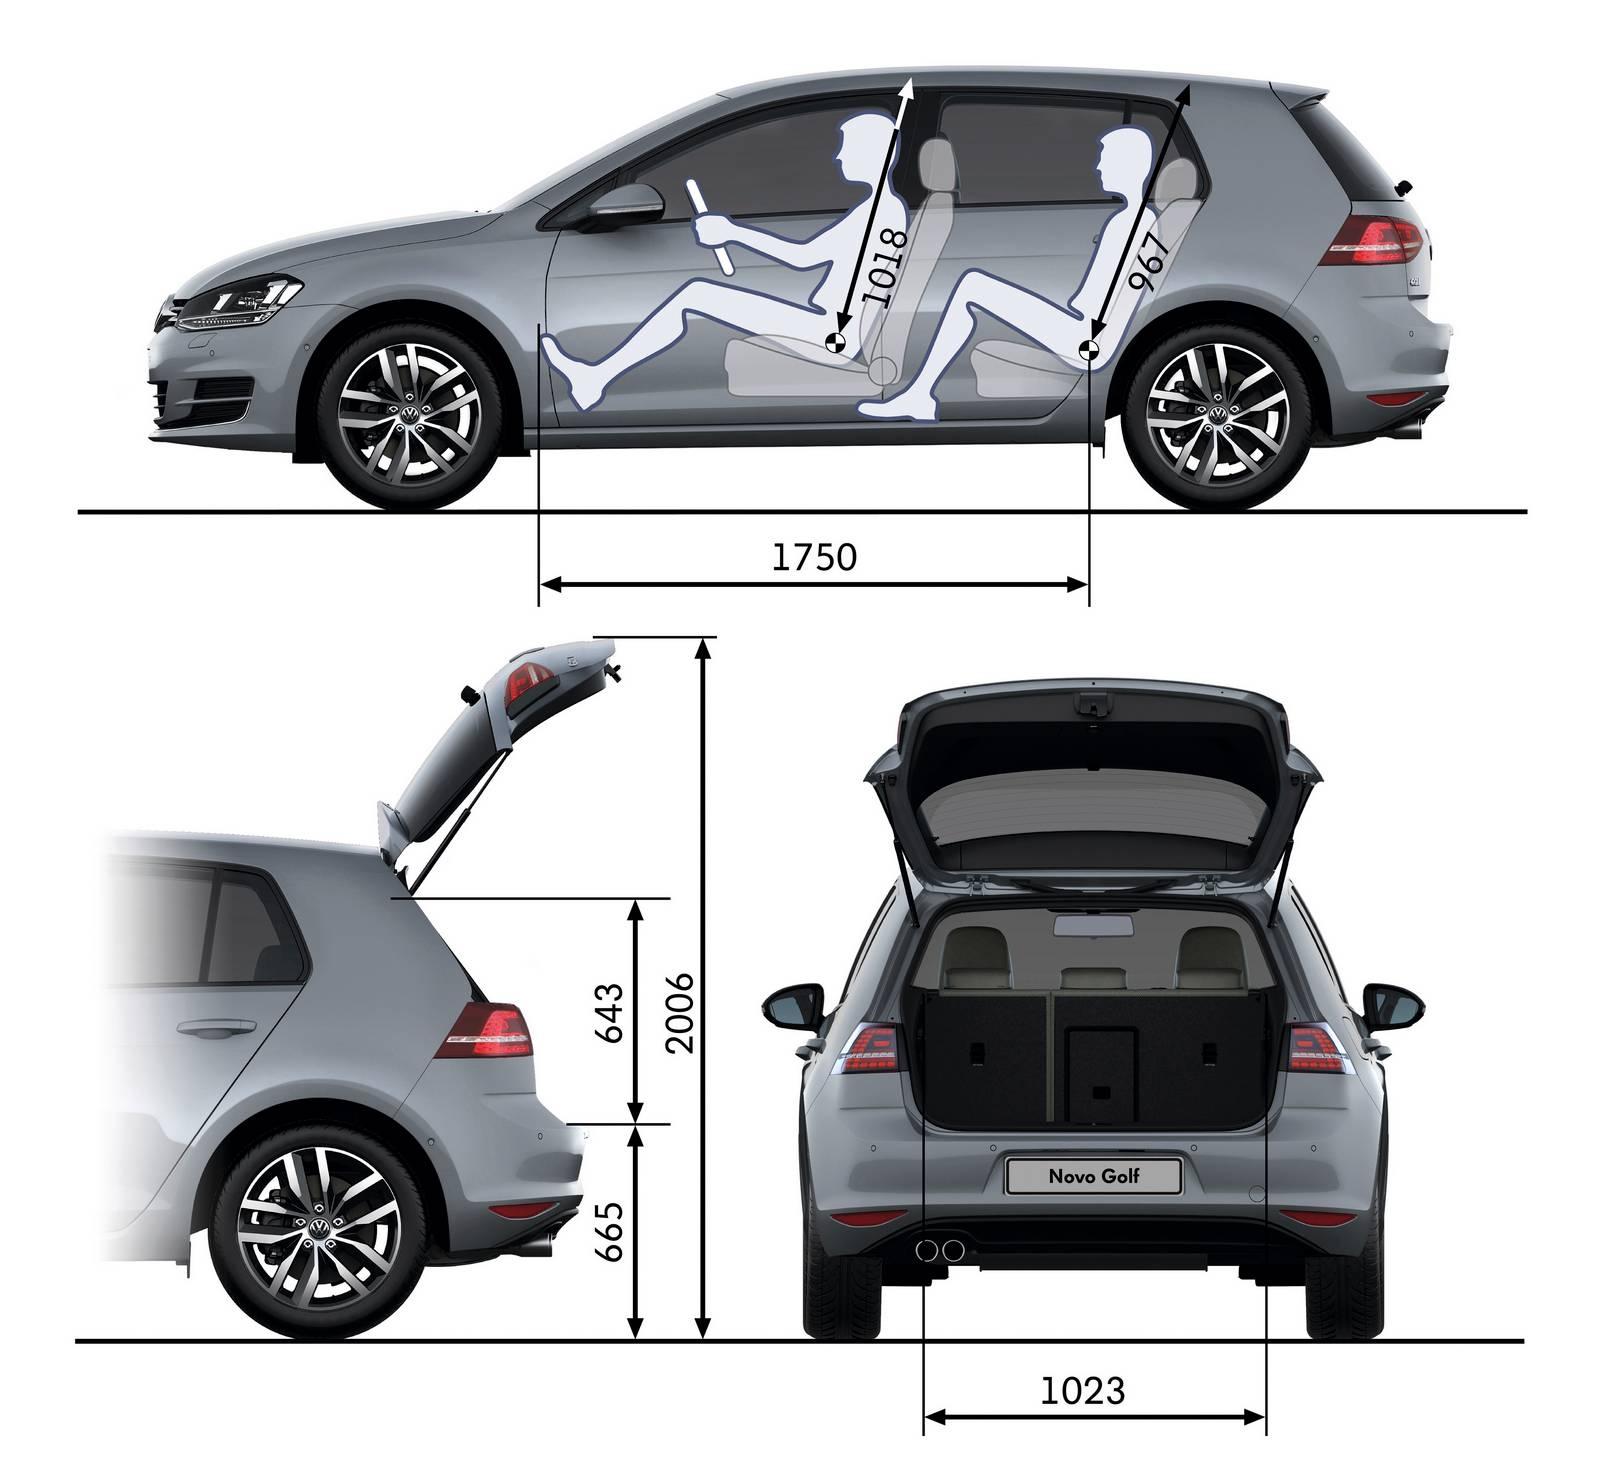 VW Golf 1.0 TSI: dimensões do hatch médio